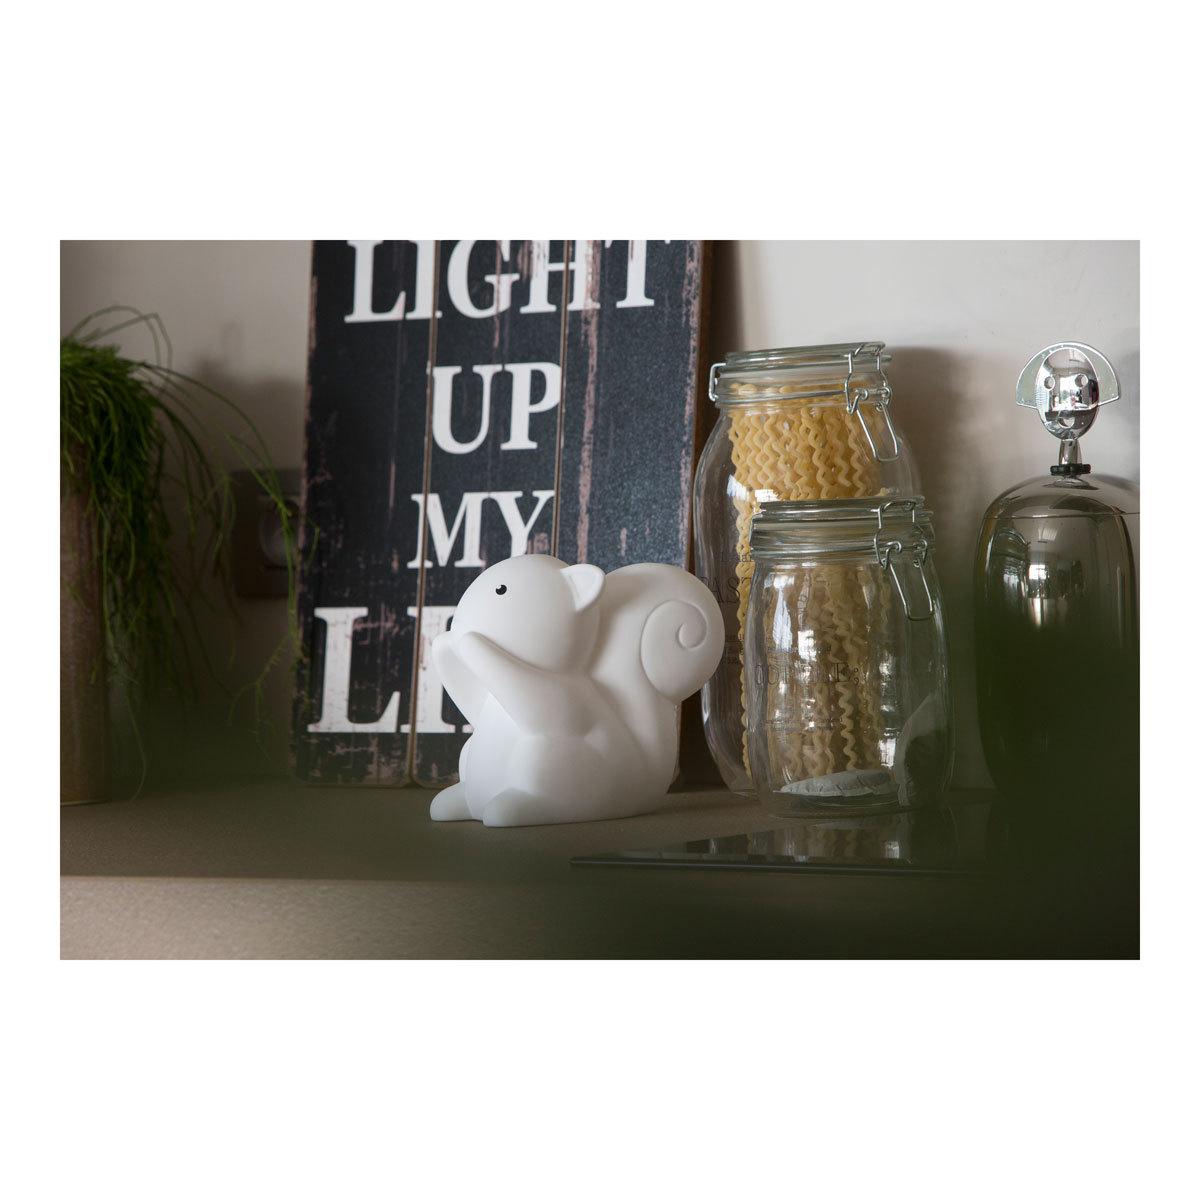 Veilleuse Veilleuse LED Betty l'Ecureuil - Blanc Veilleuse LED Betty l'Ecureuil - Blanc